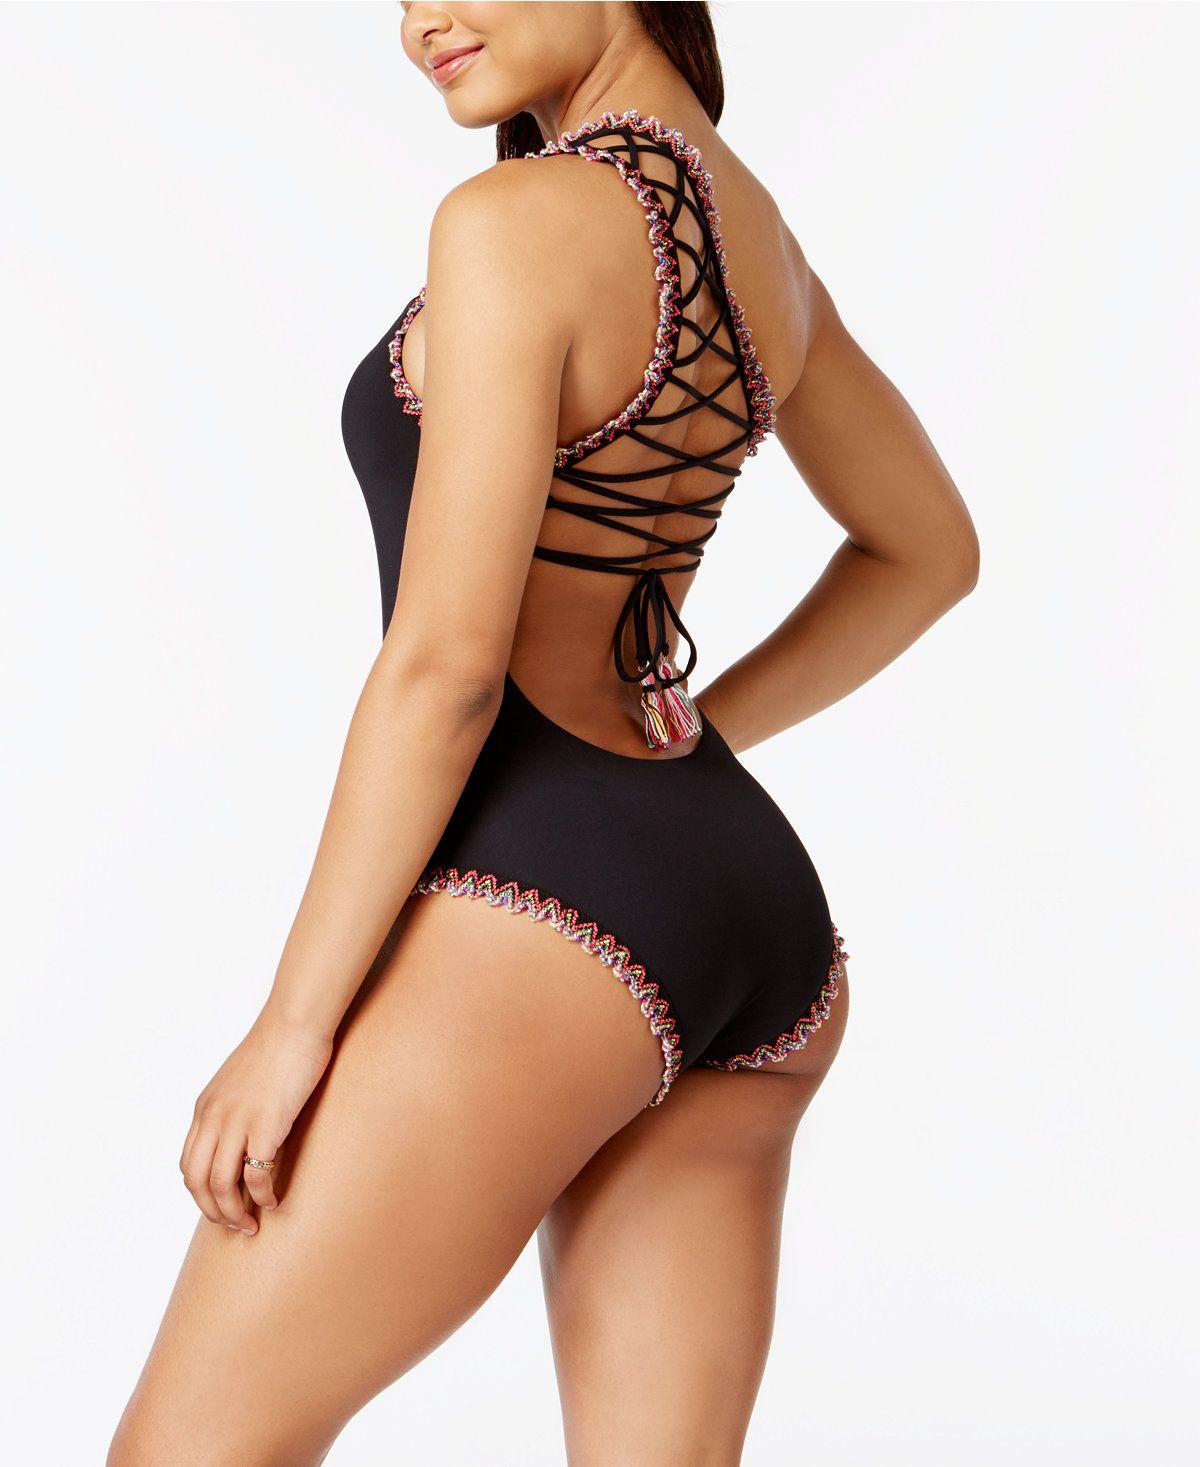 00492b61844 Becca Mardi Gras One-Shoulder Embroidered Swimsuit - Swimwear - Women -  Macy's